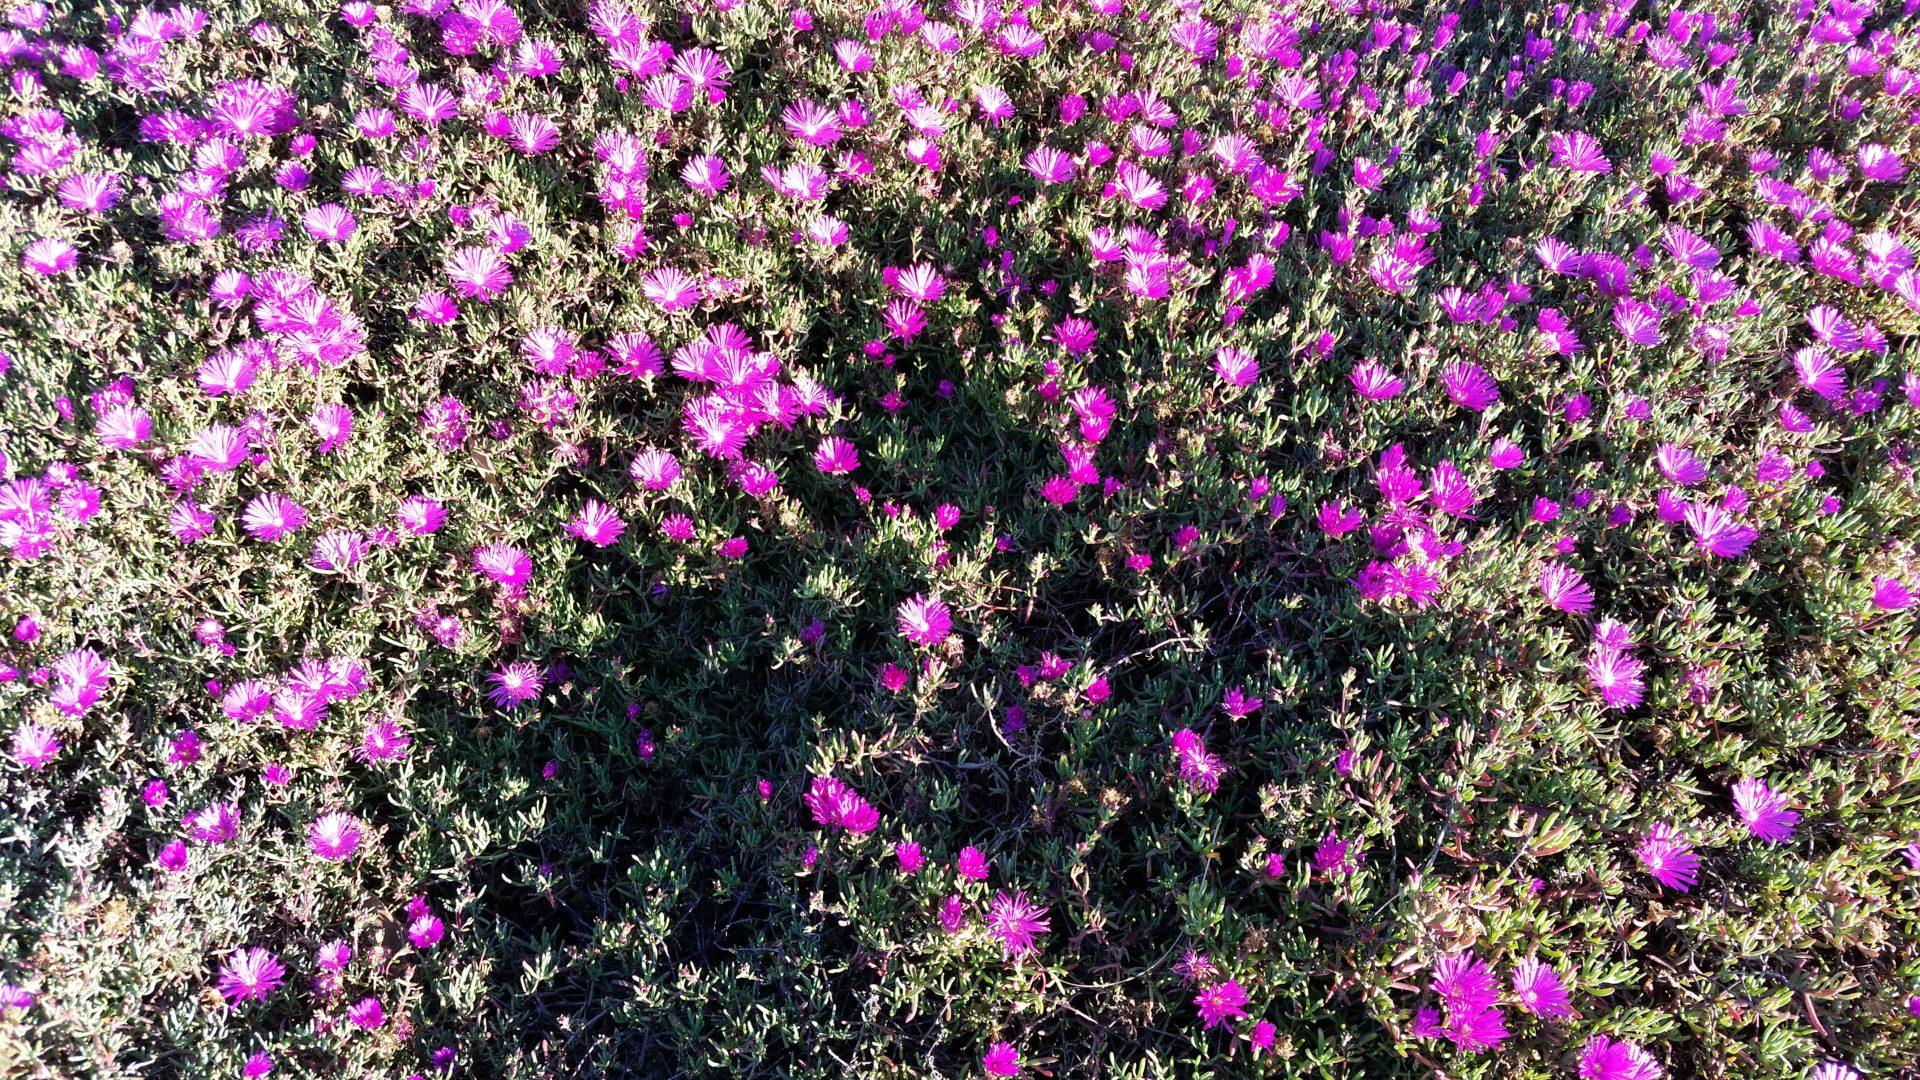 Masses of Purple